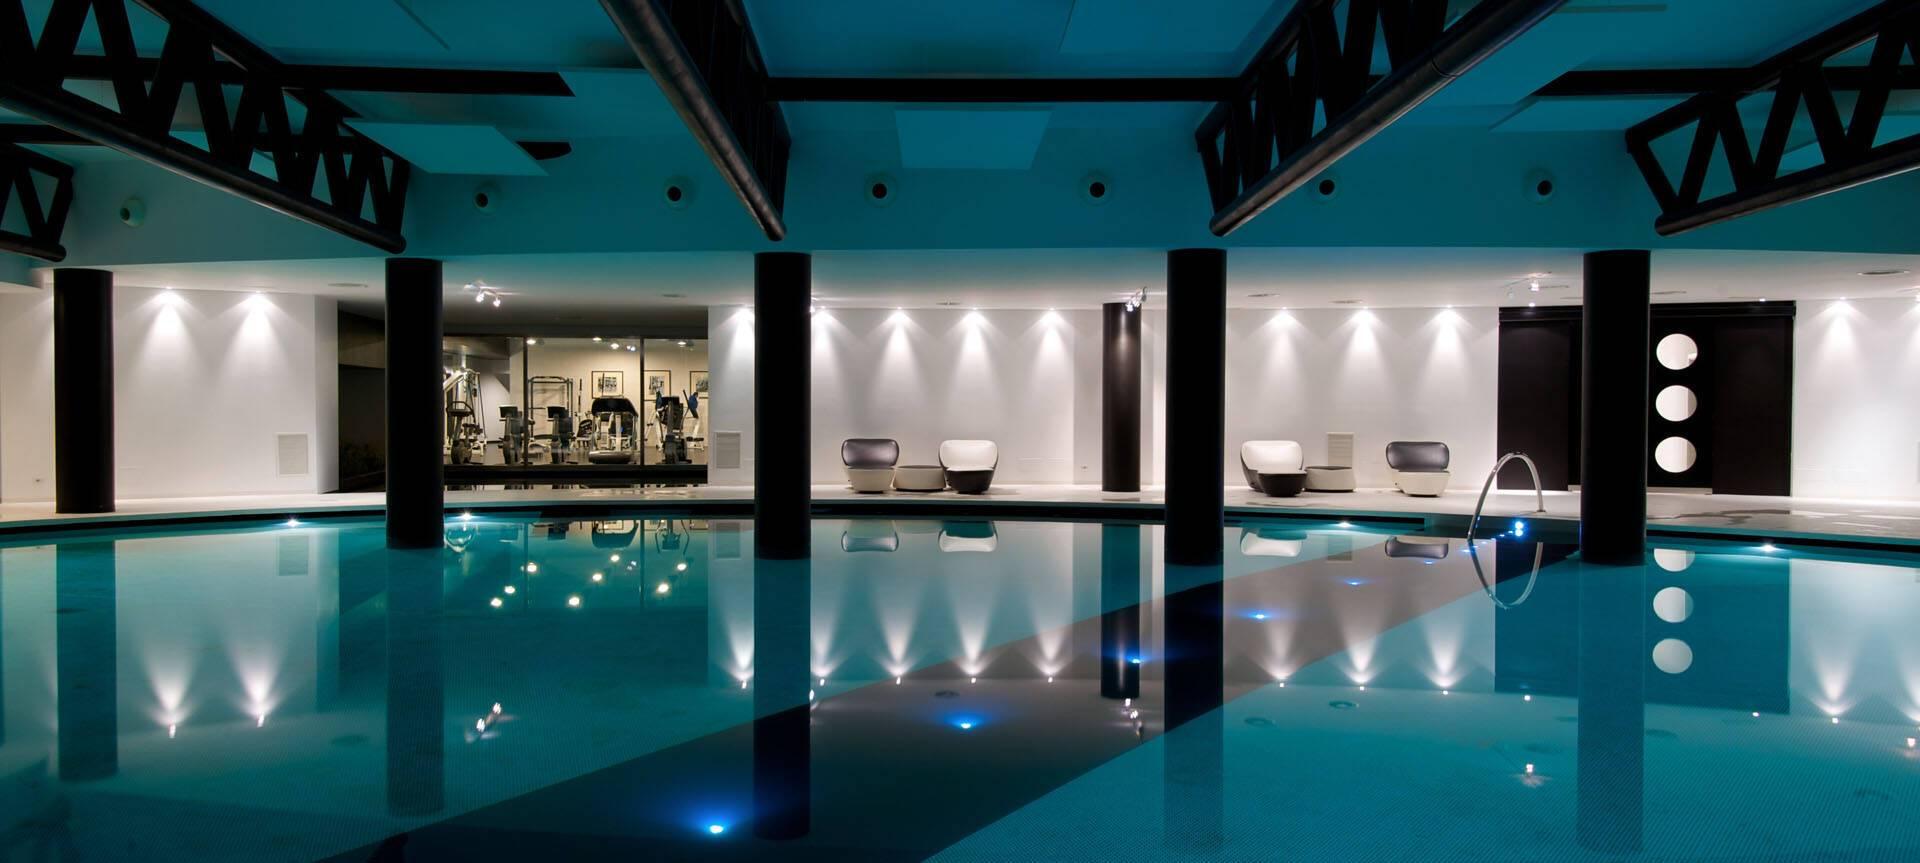 Argentario Porto Ercole Toscane Wellness Center